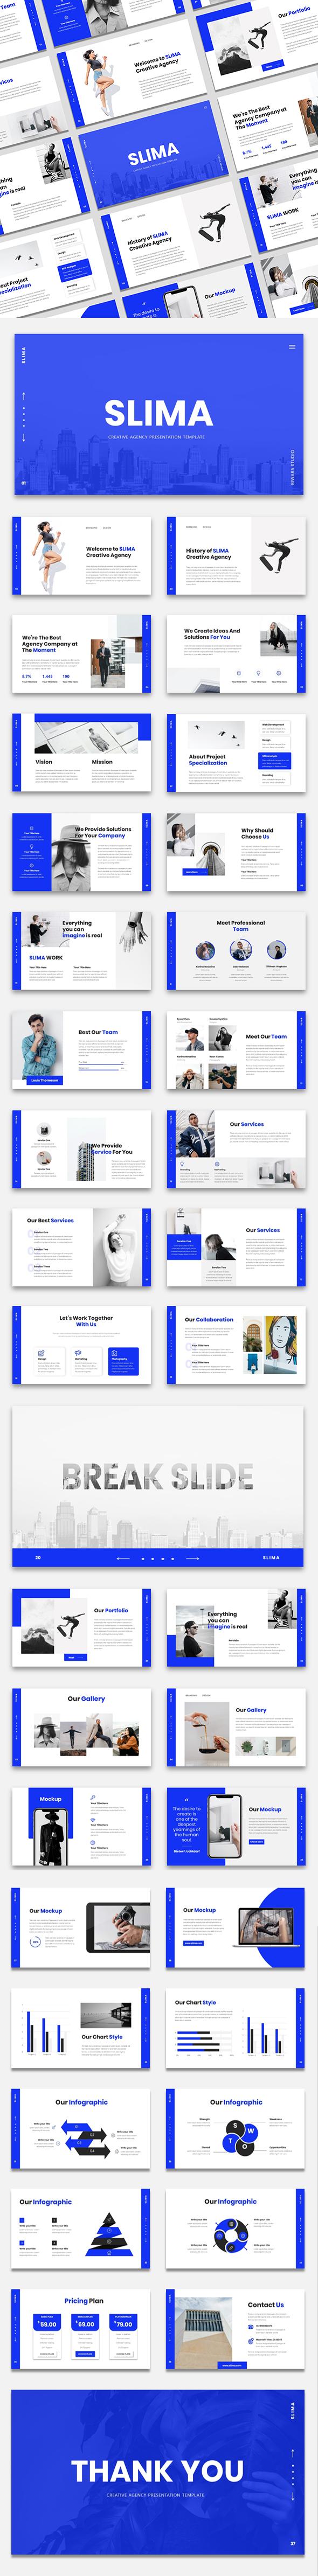 SLIMA - Creative Agency Keynote Presentation Template